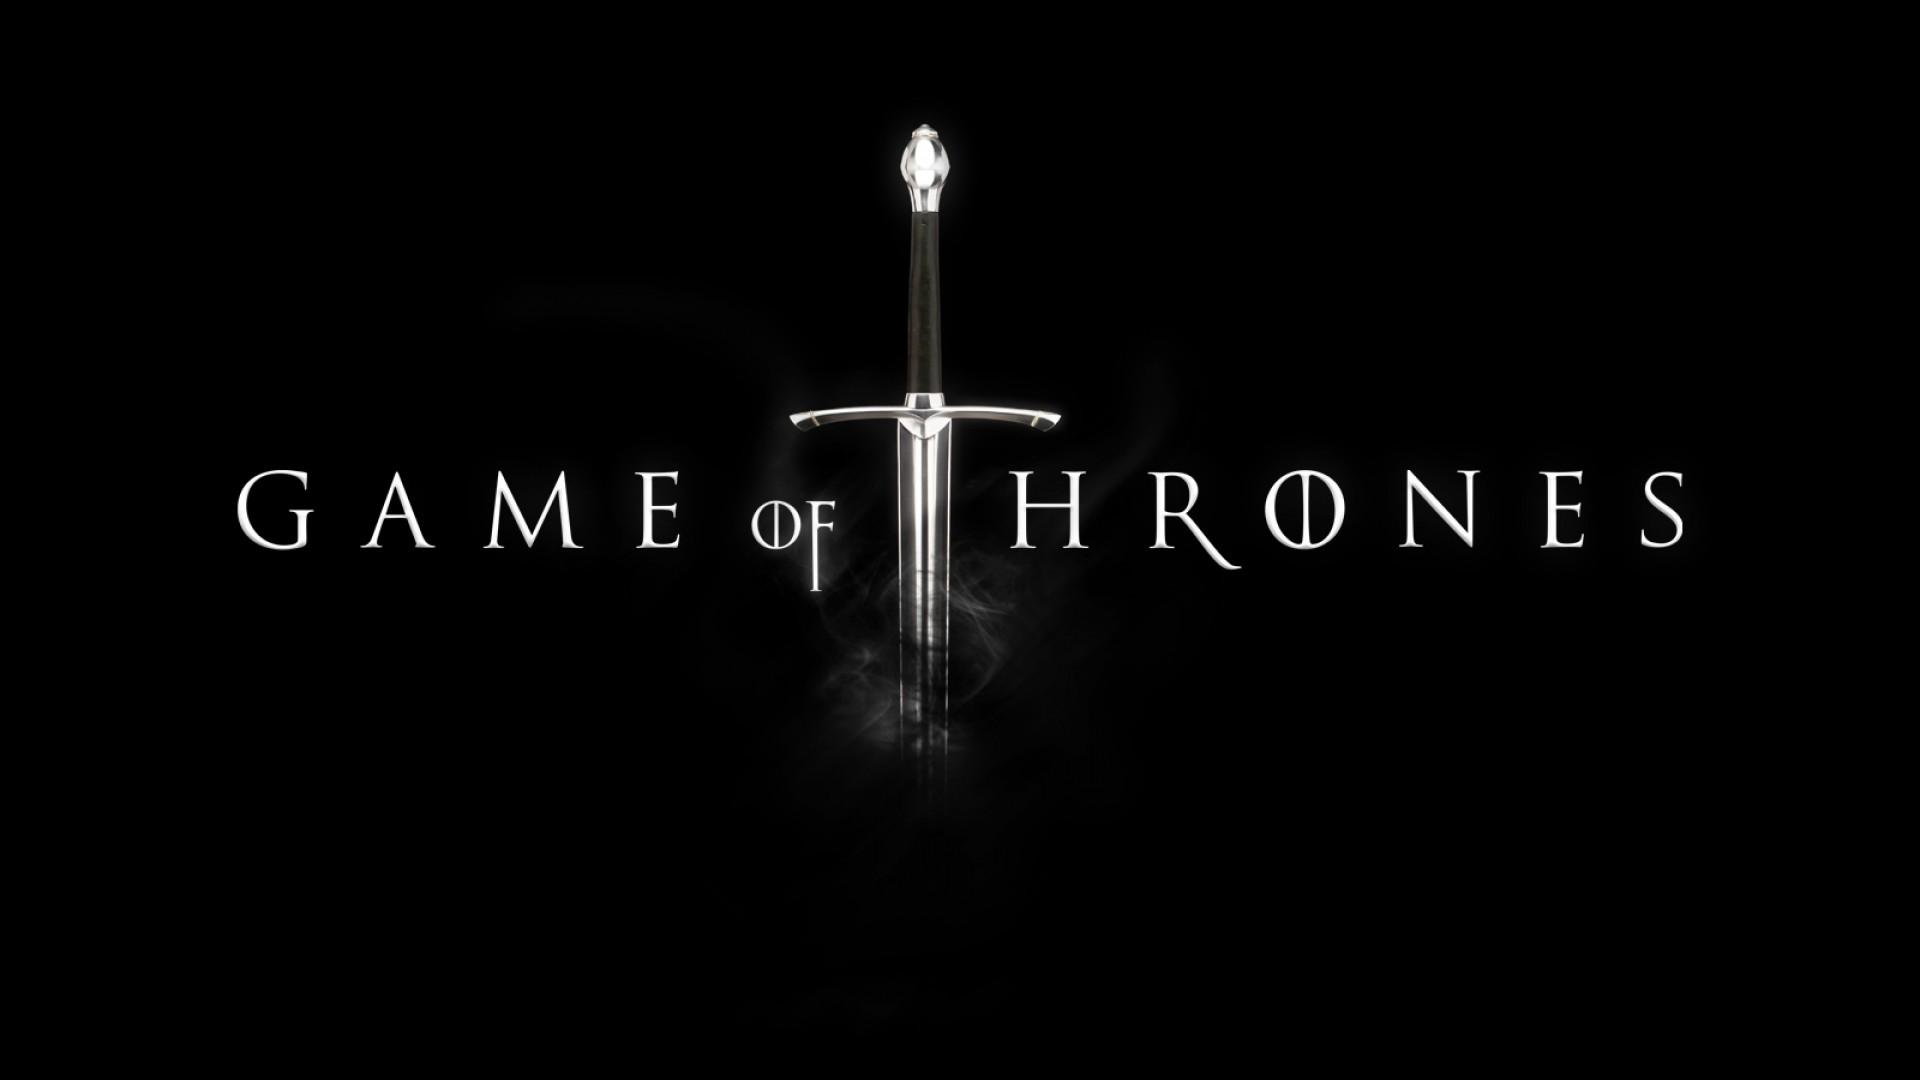 game-of-thrones-logo-wallpaper-1.jpg - Gameofthrones HD PNG